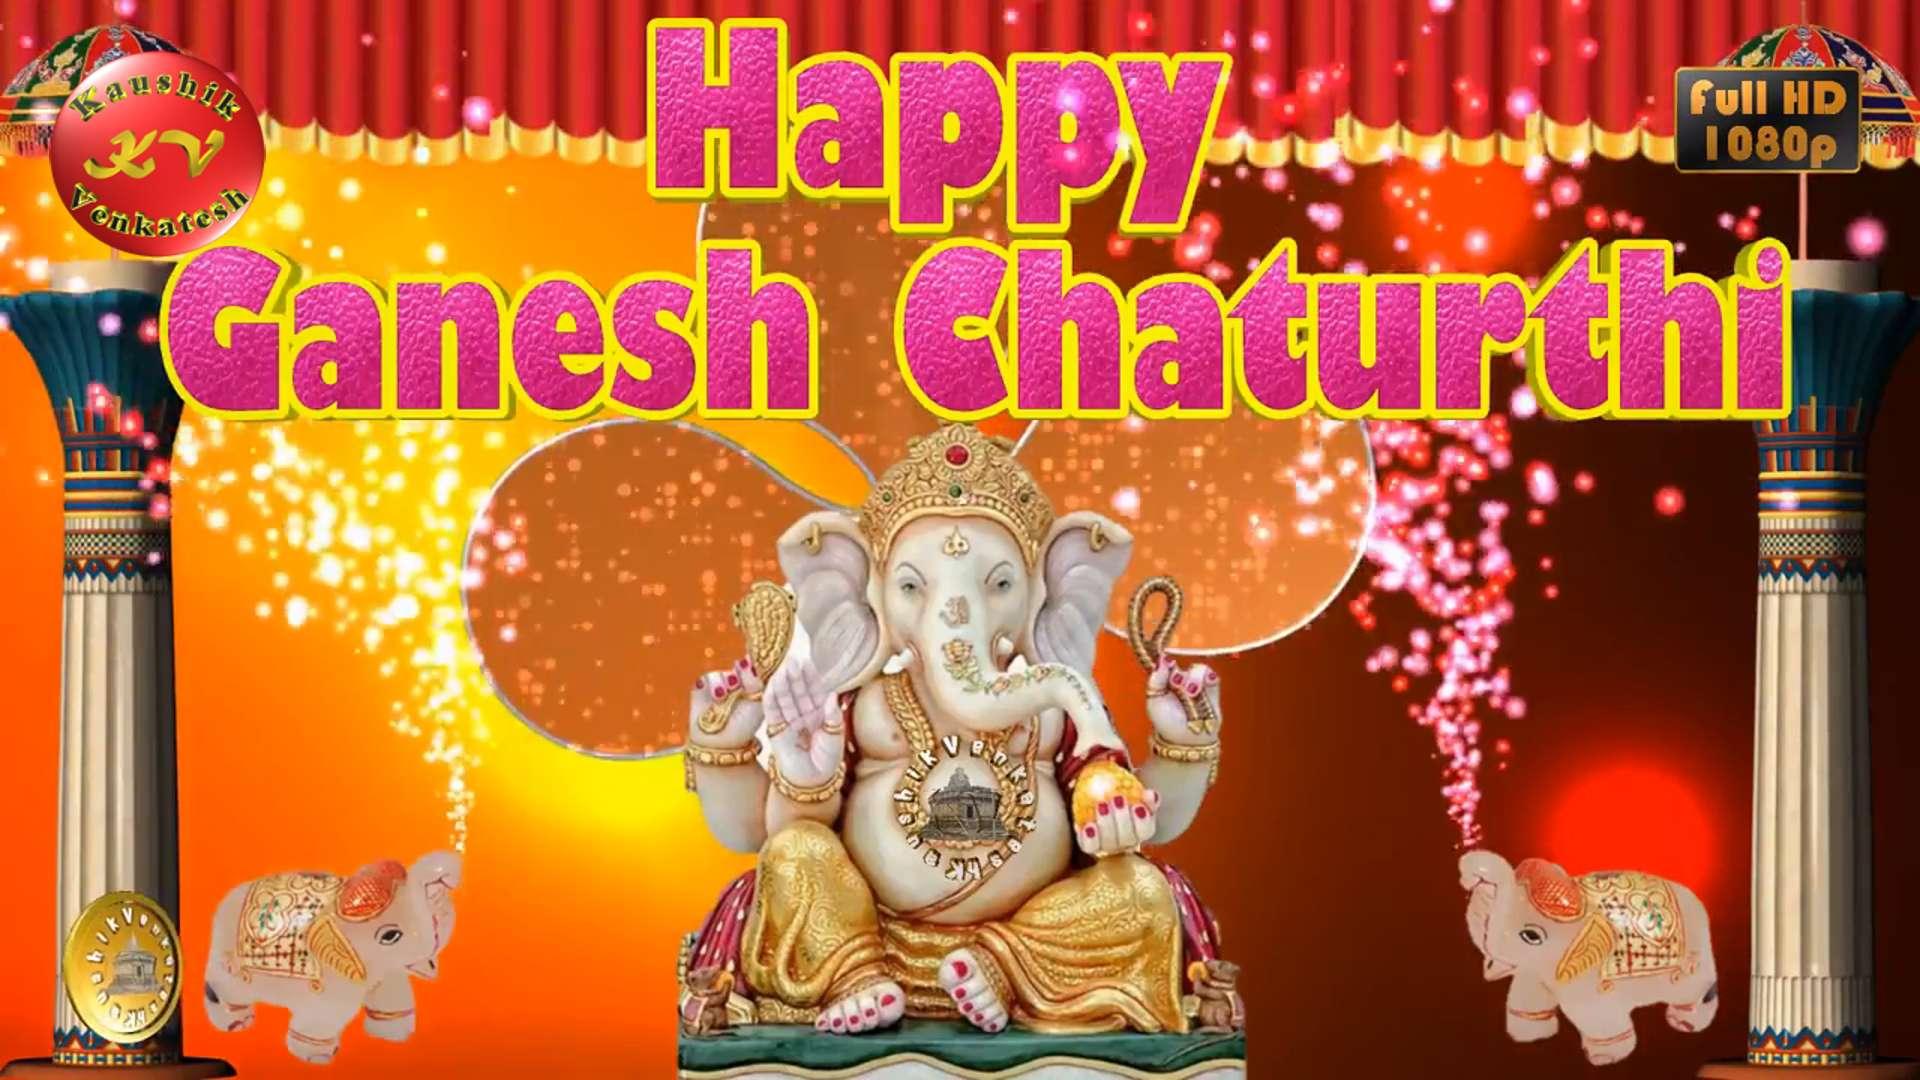 Greetings for Ganesh Chaturthi Video